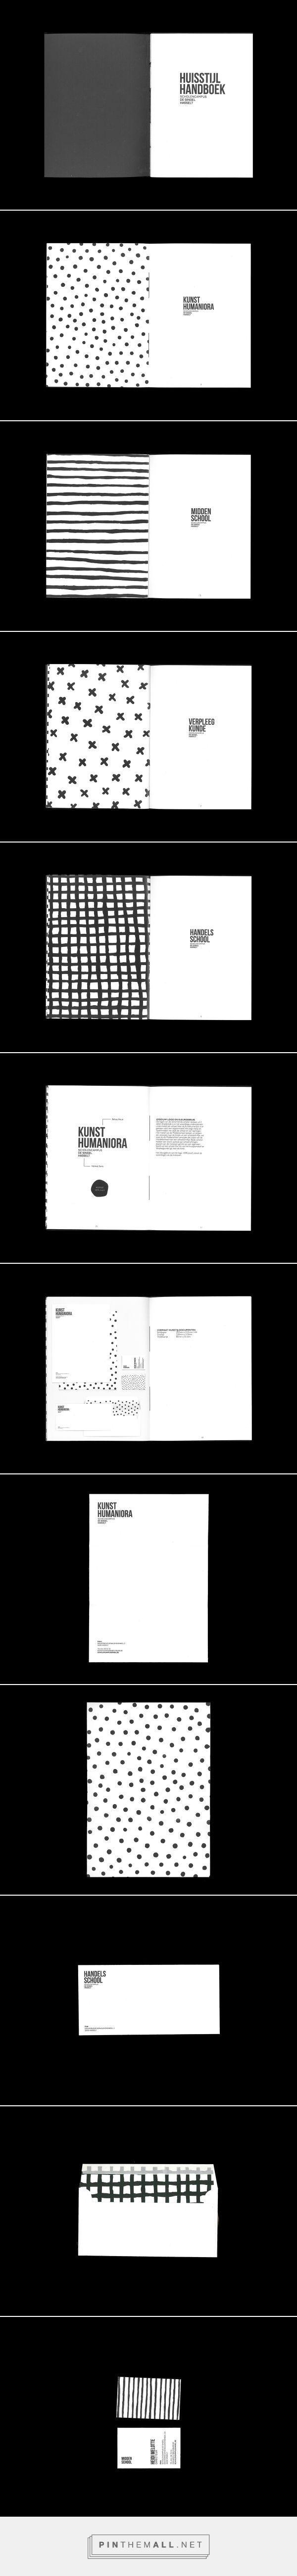 referencia texturas para parte interna